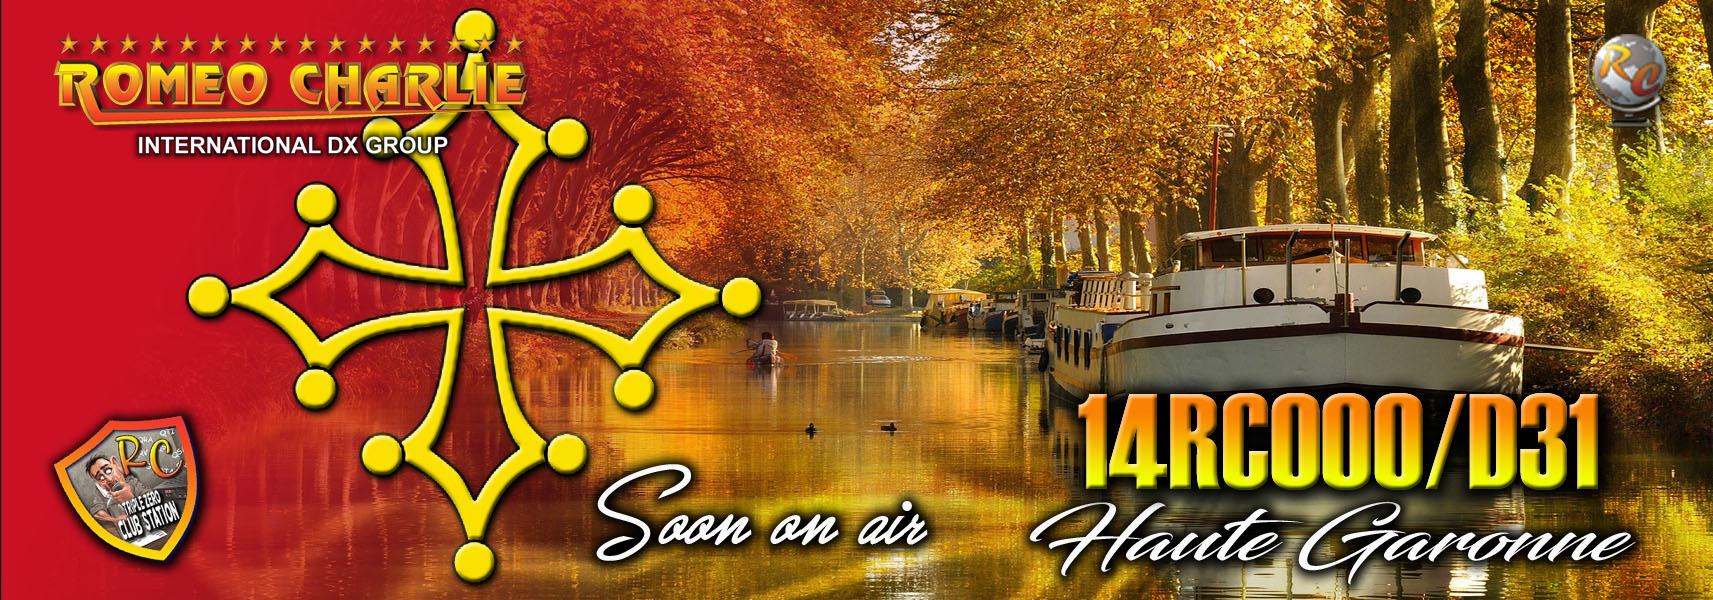 banner 14rc000d31